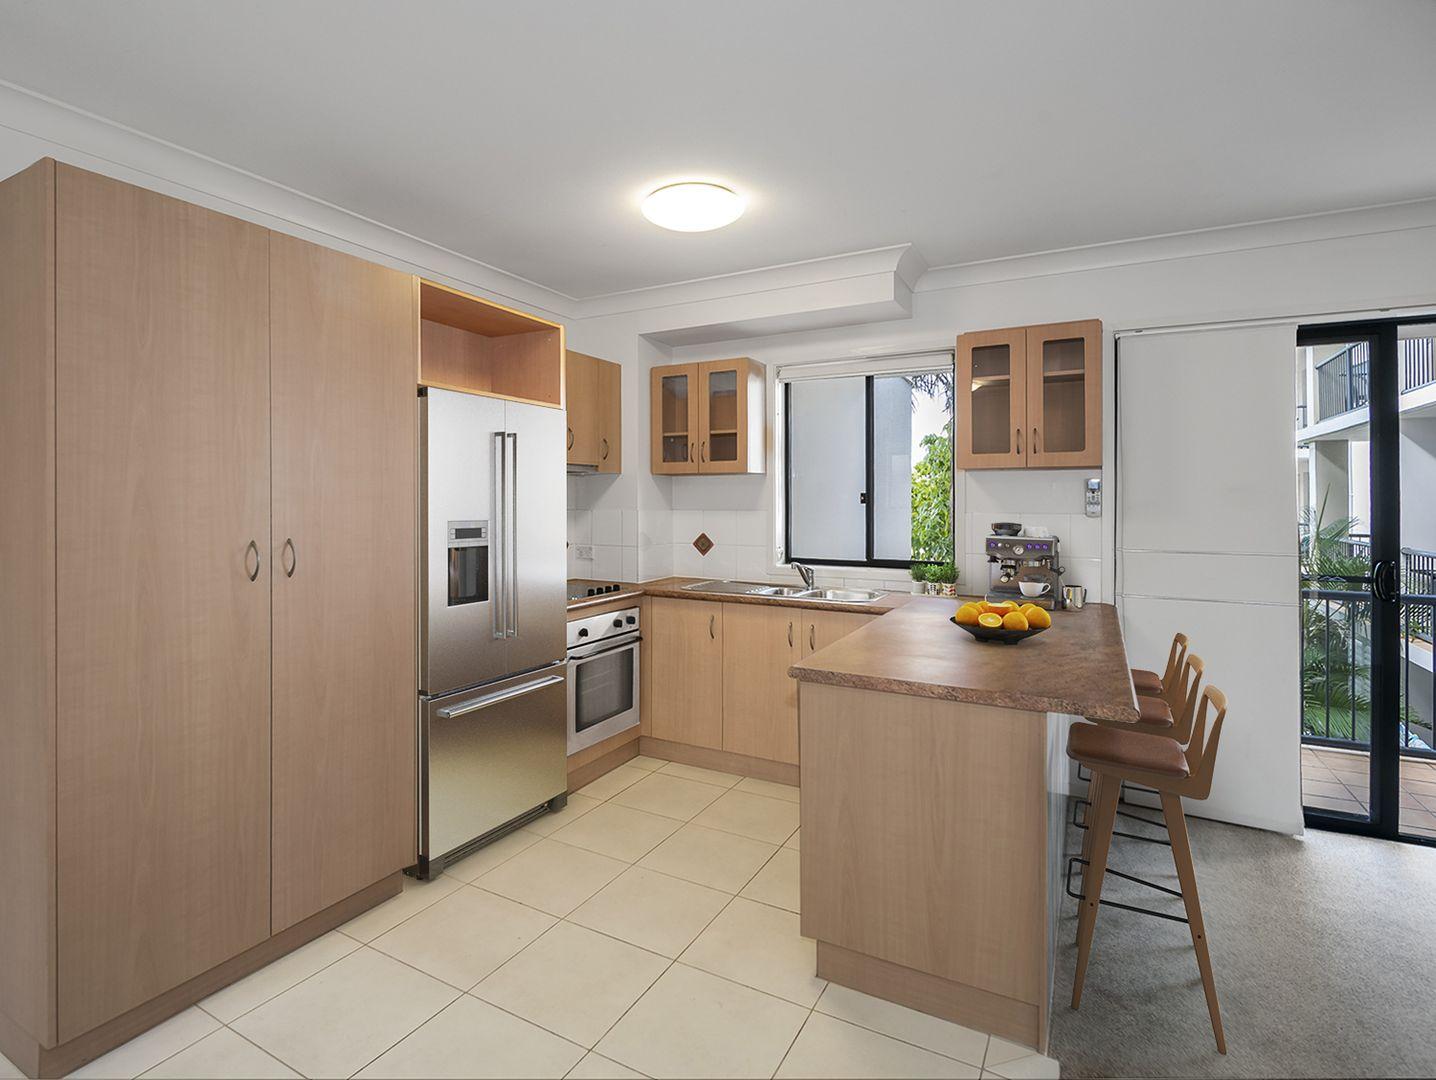 26/52-62 Newstead Terrace, Newstead QLD 4006, Image 1